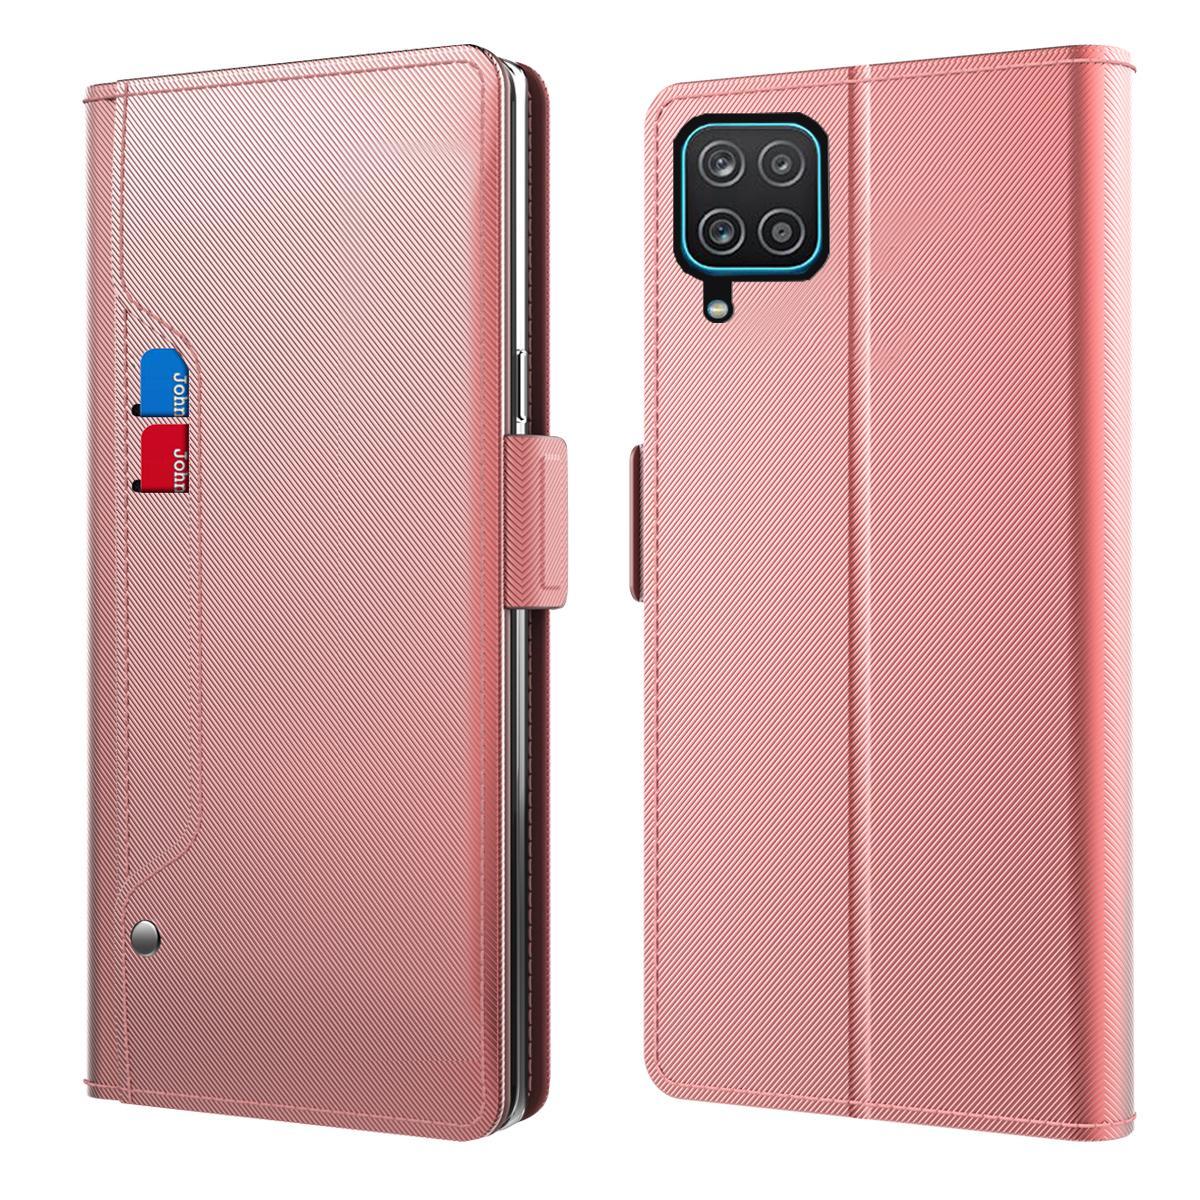 Suojakotelo Peili Samsung Galaxy A42 5G Vaaleanpunainen